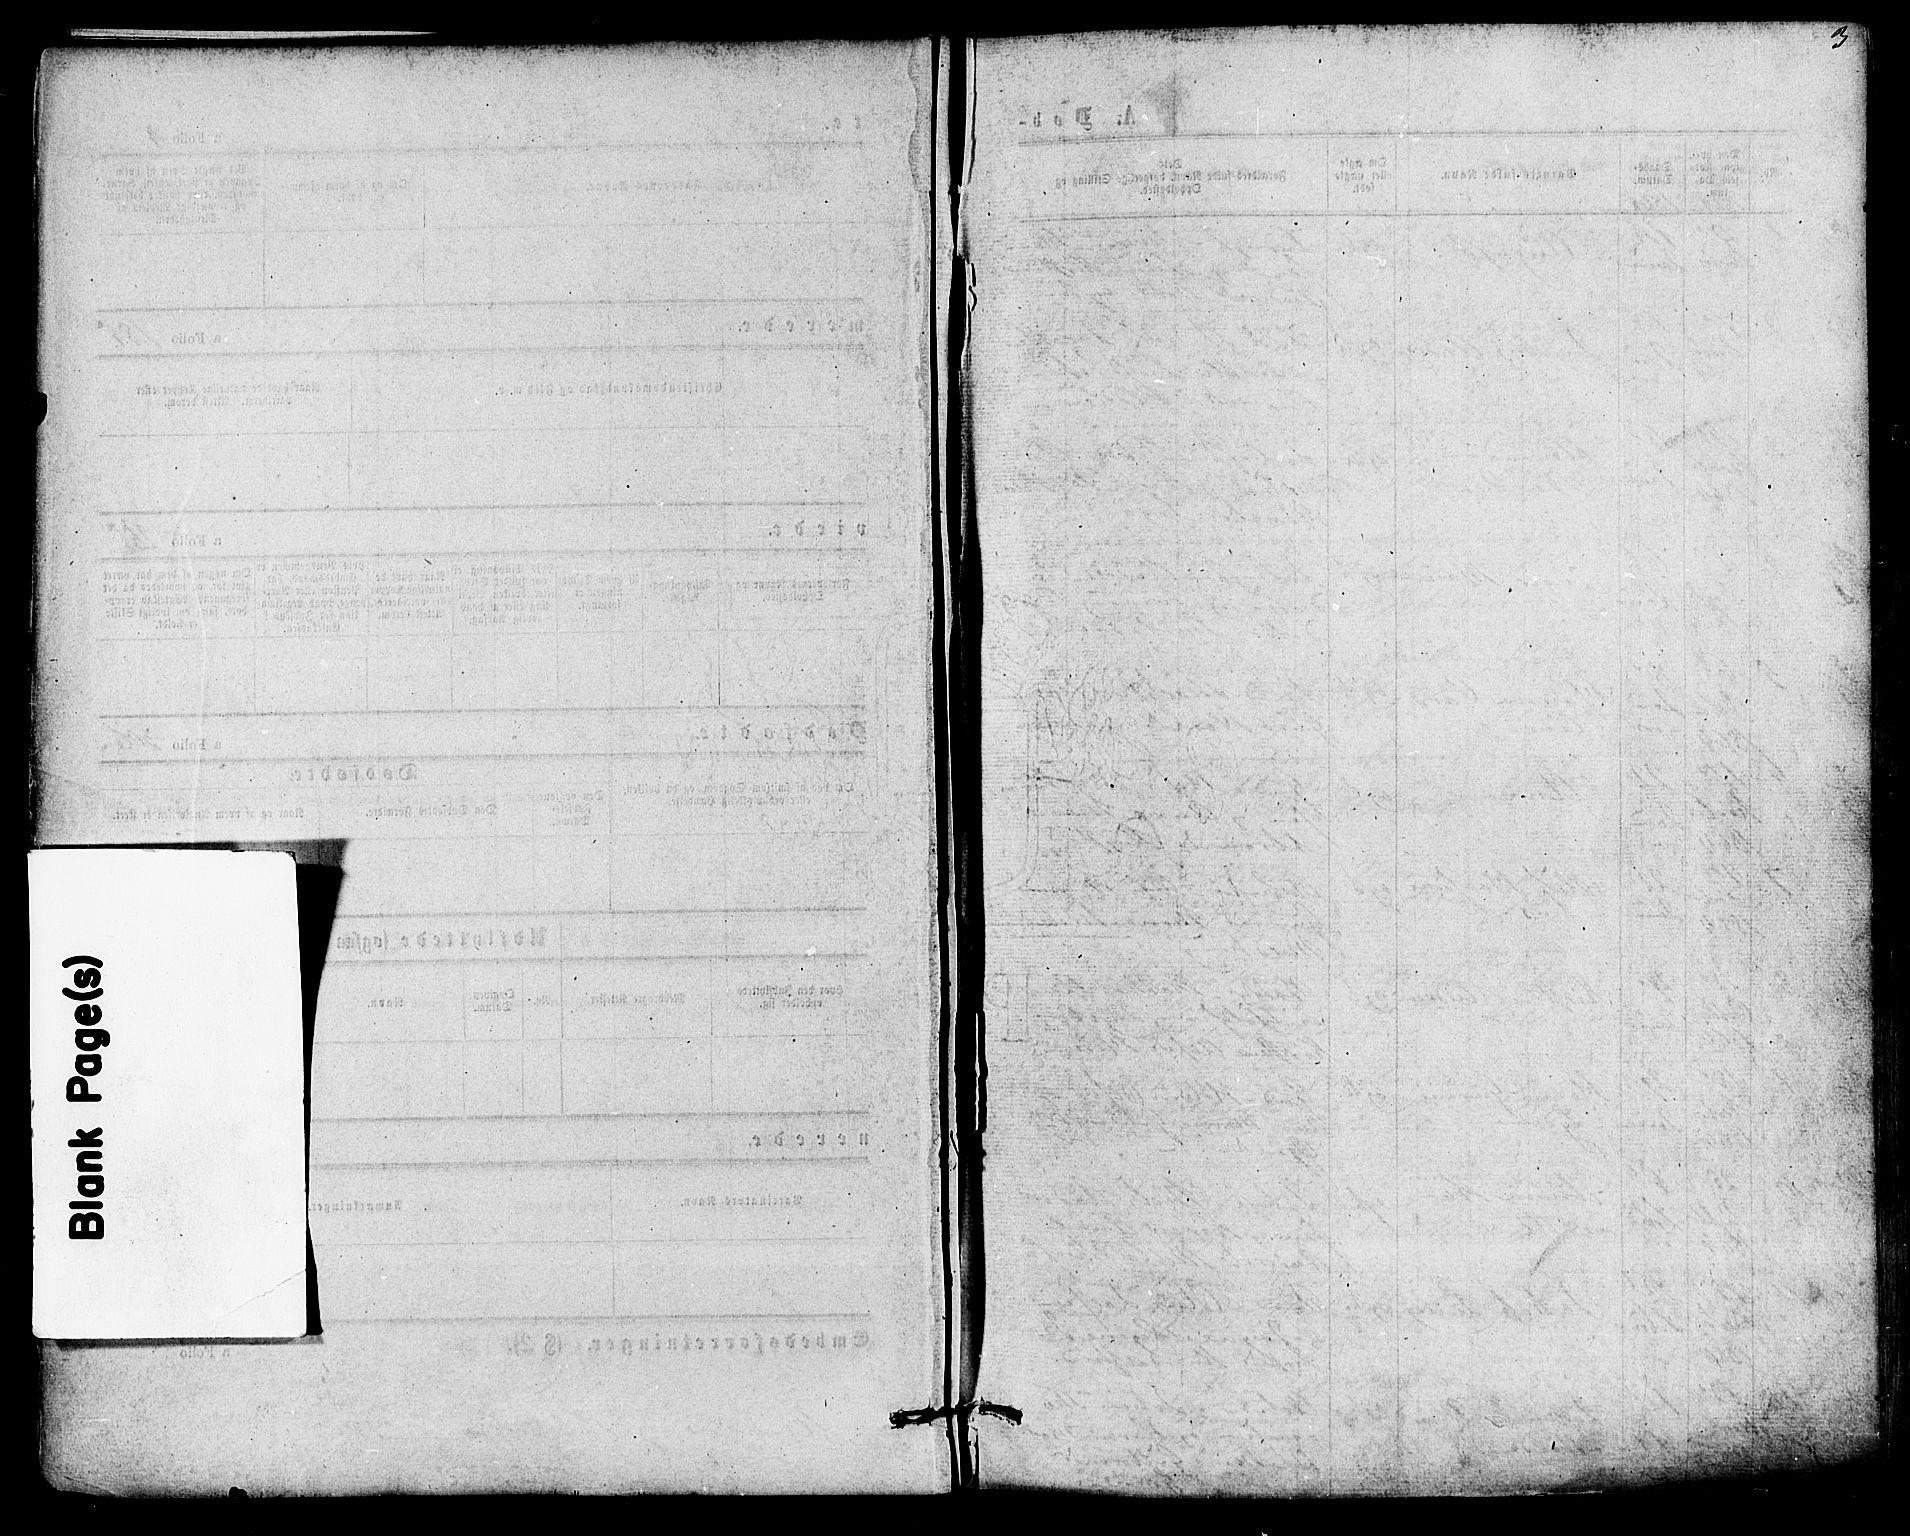 SAKO, Solum kirkebøker, F/Fa/L0008: Ministerialbok nr. I 8, 1865-1876, s. 3